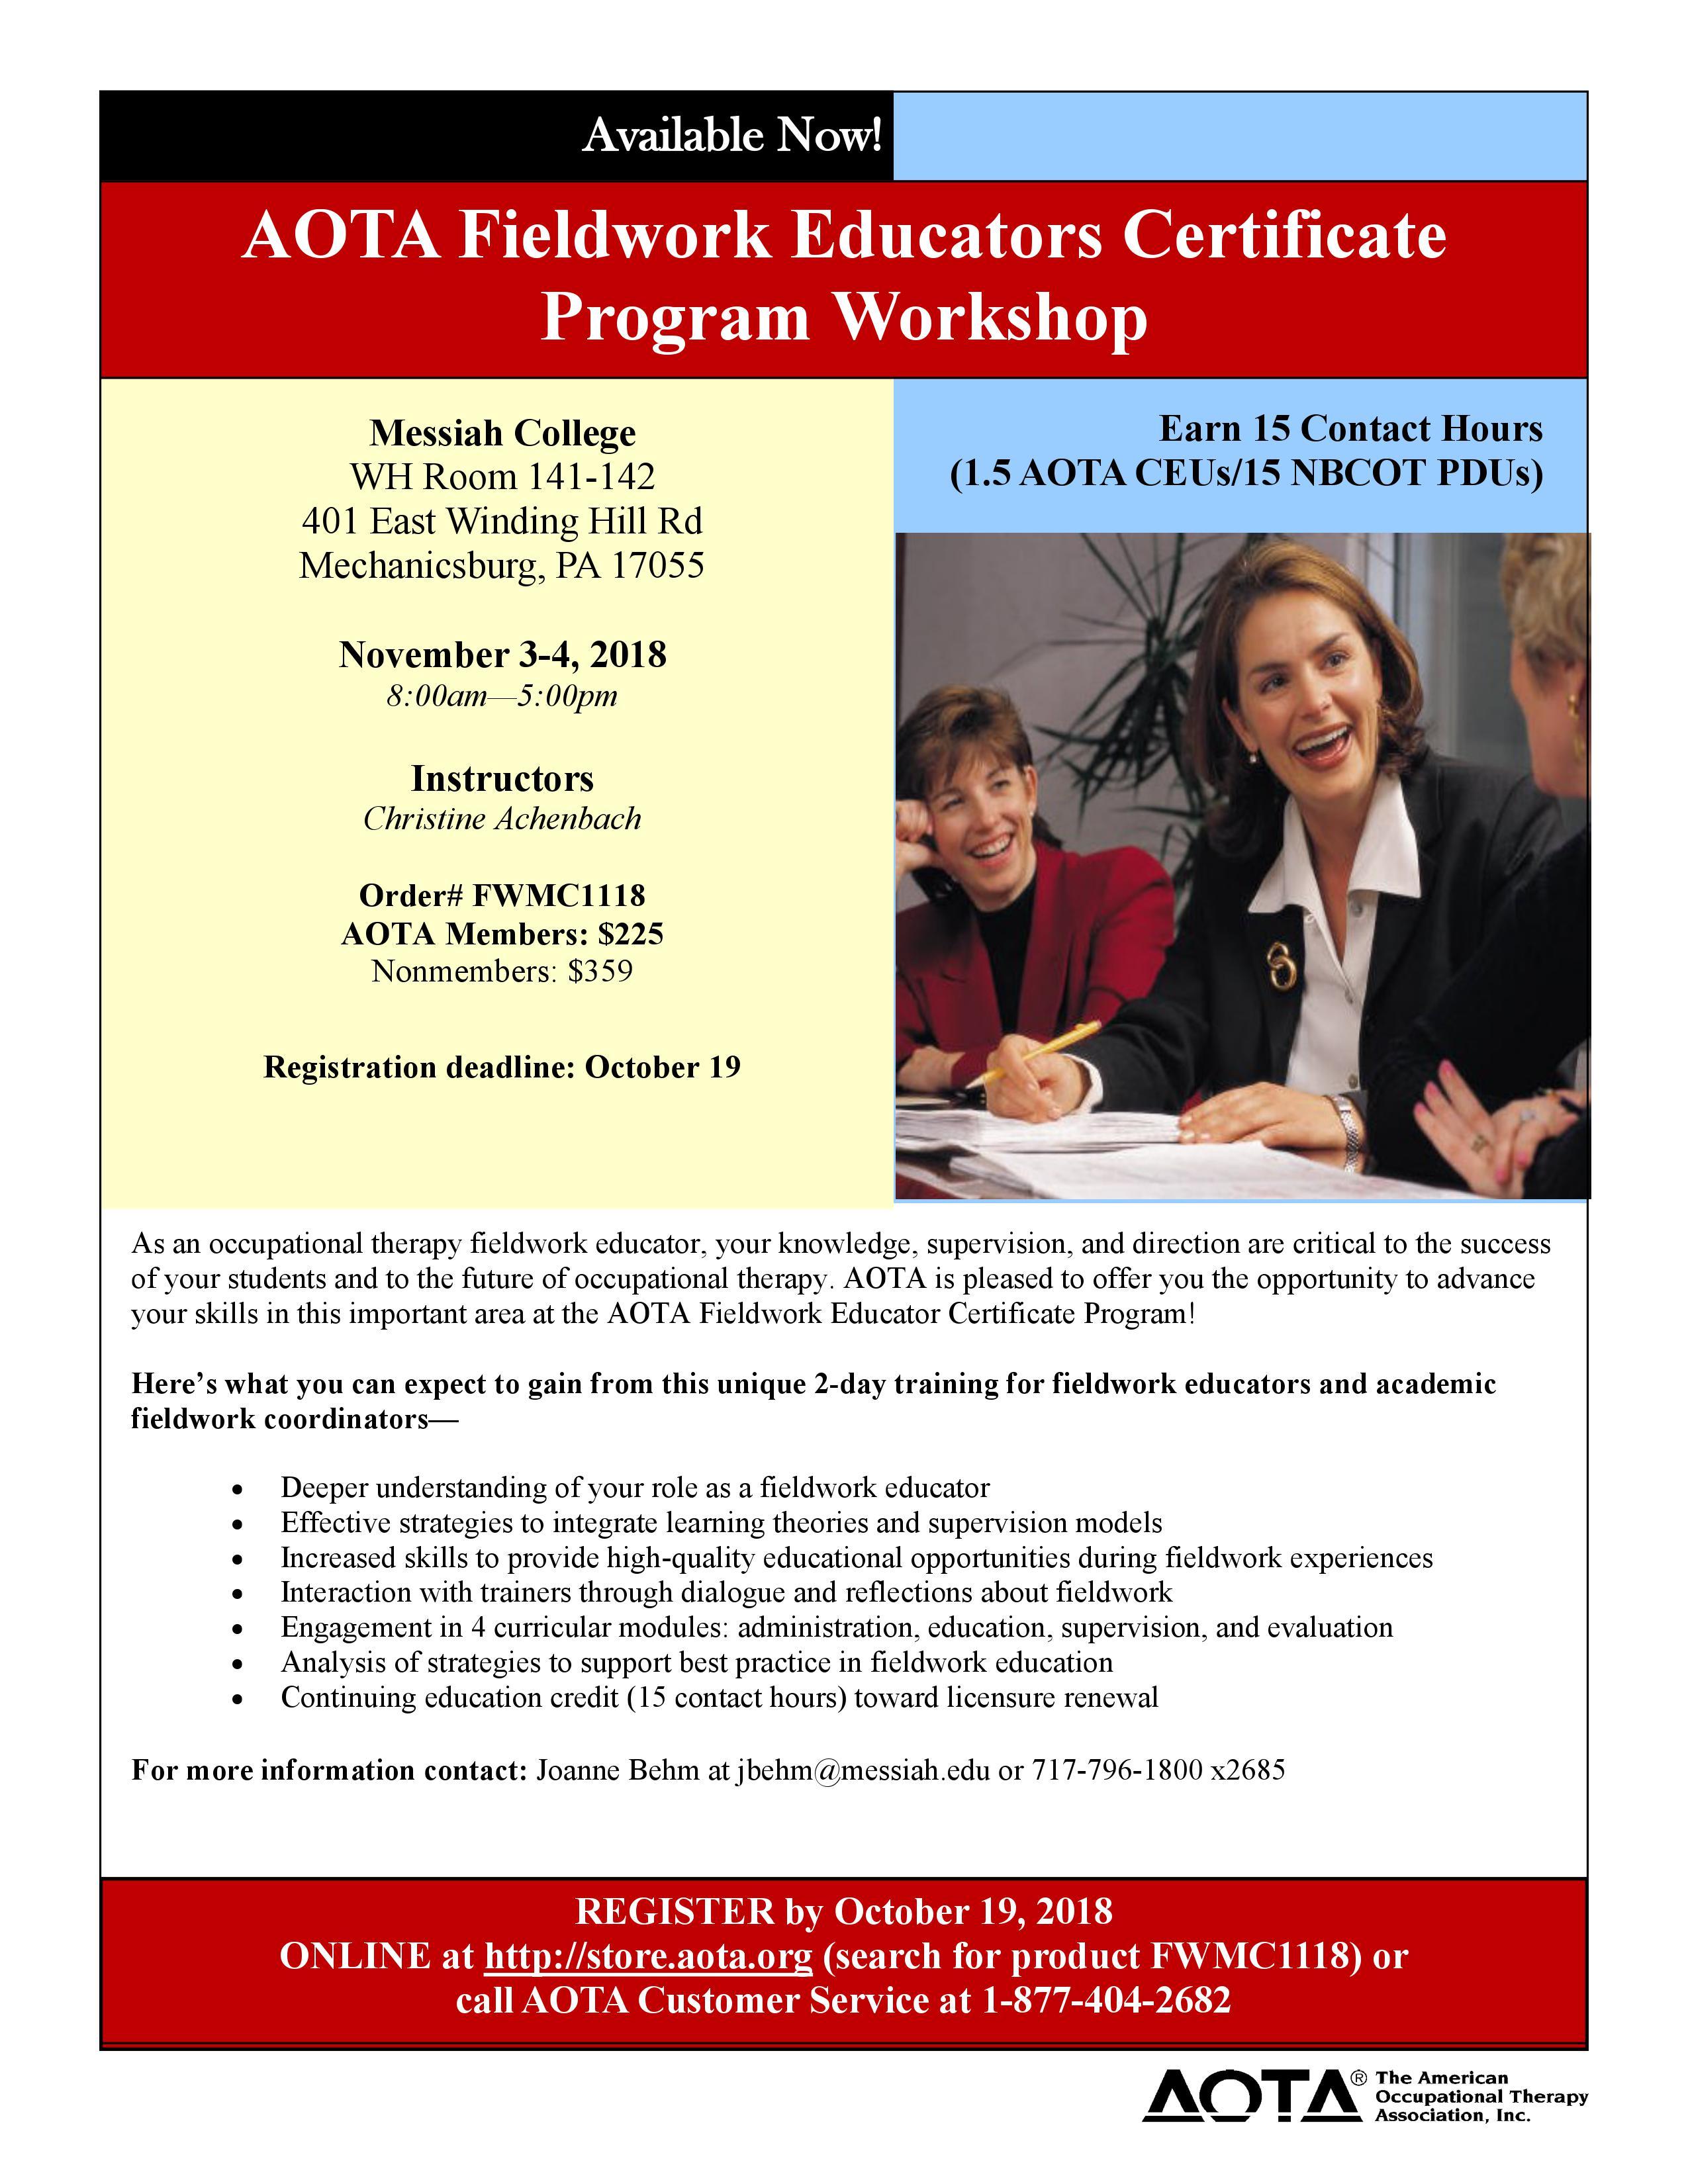 Flyer for Fieldwork Educator Certificate Program in November 2018